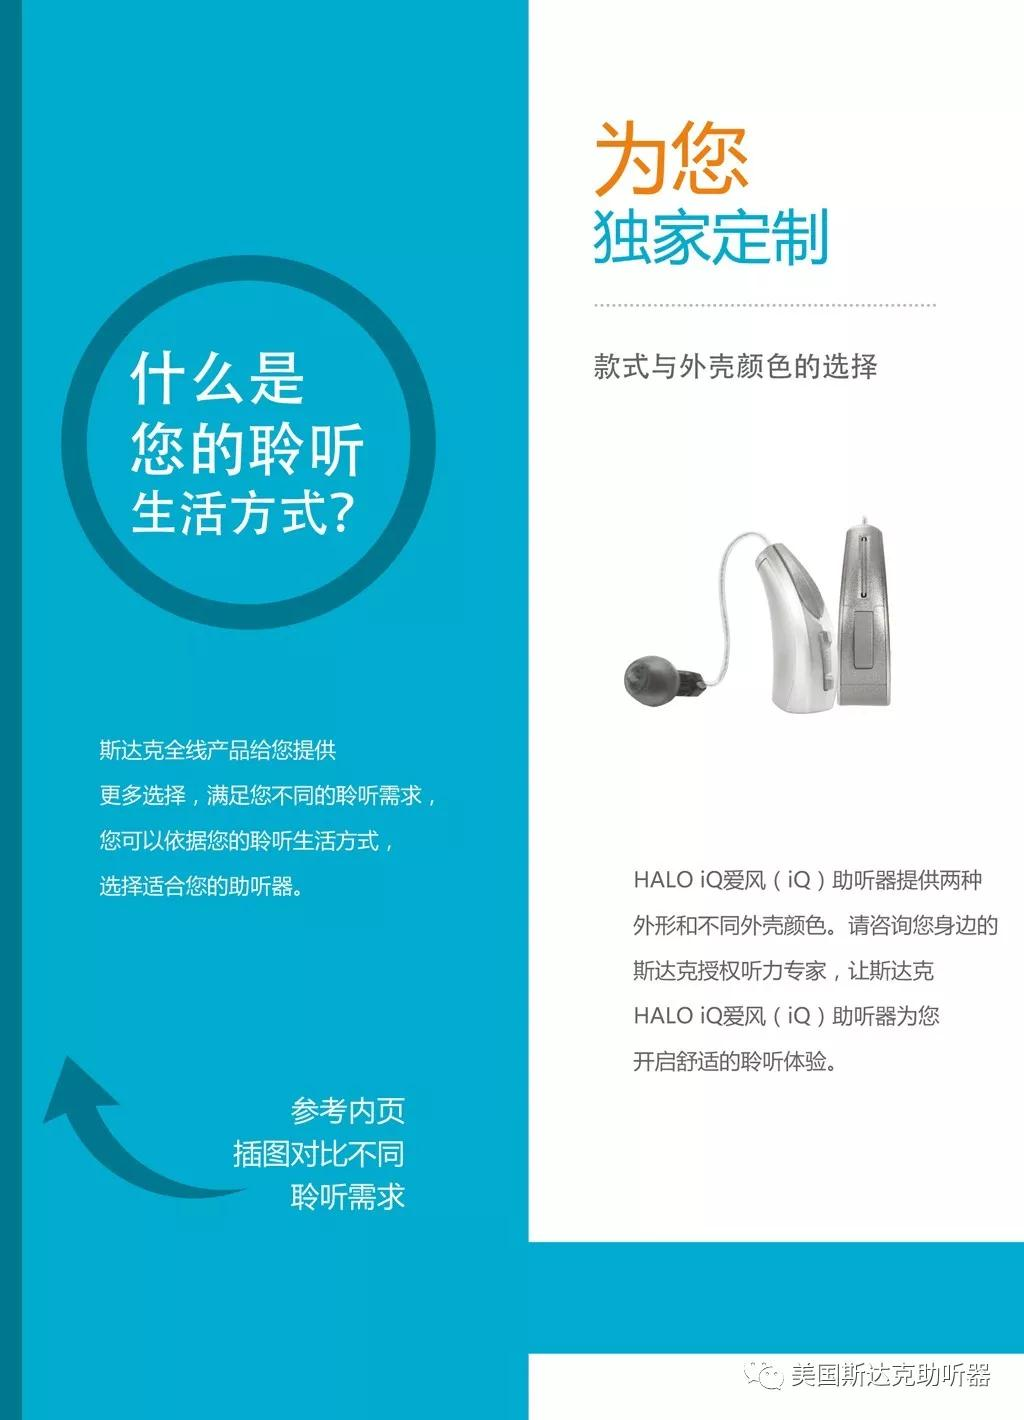 斯达克HALO IQ爱风(IQ)助听器